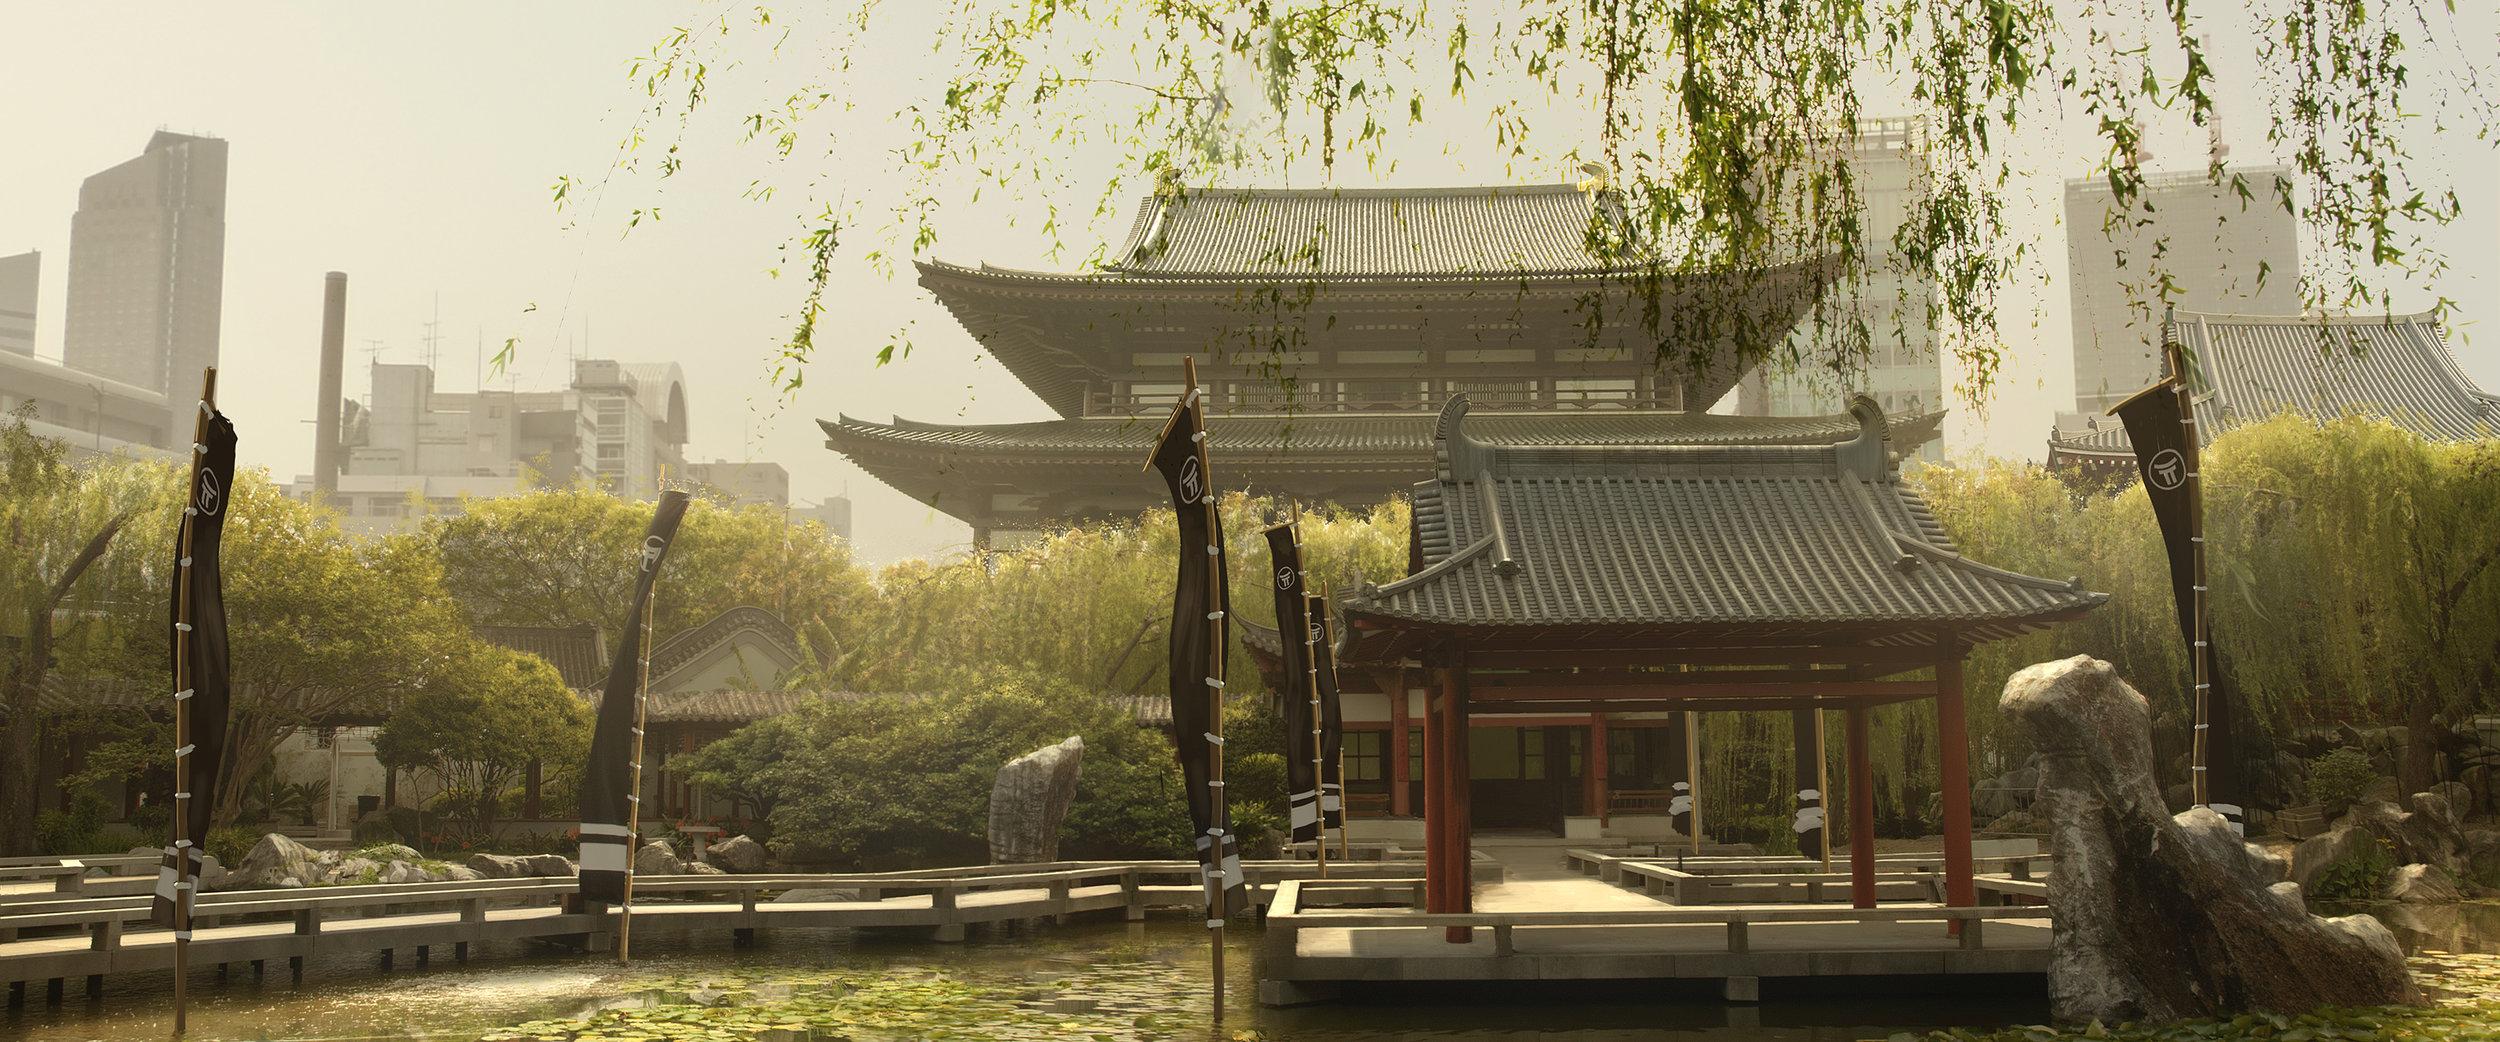 Tokyo - Buddhist temple